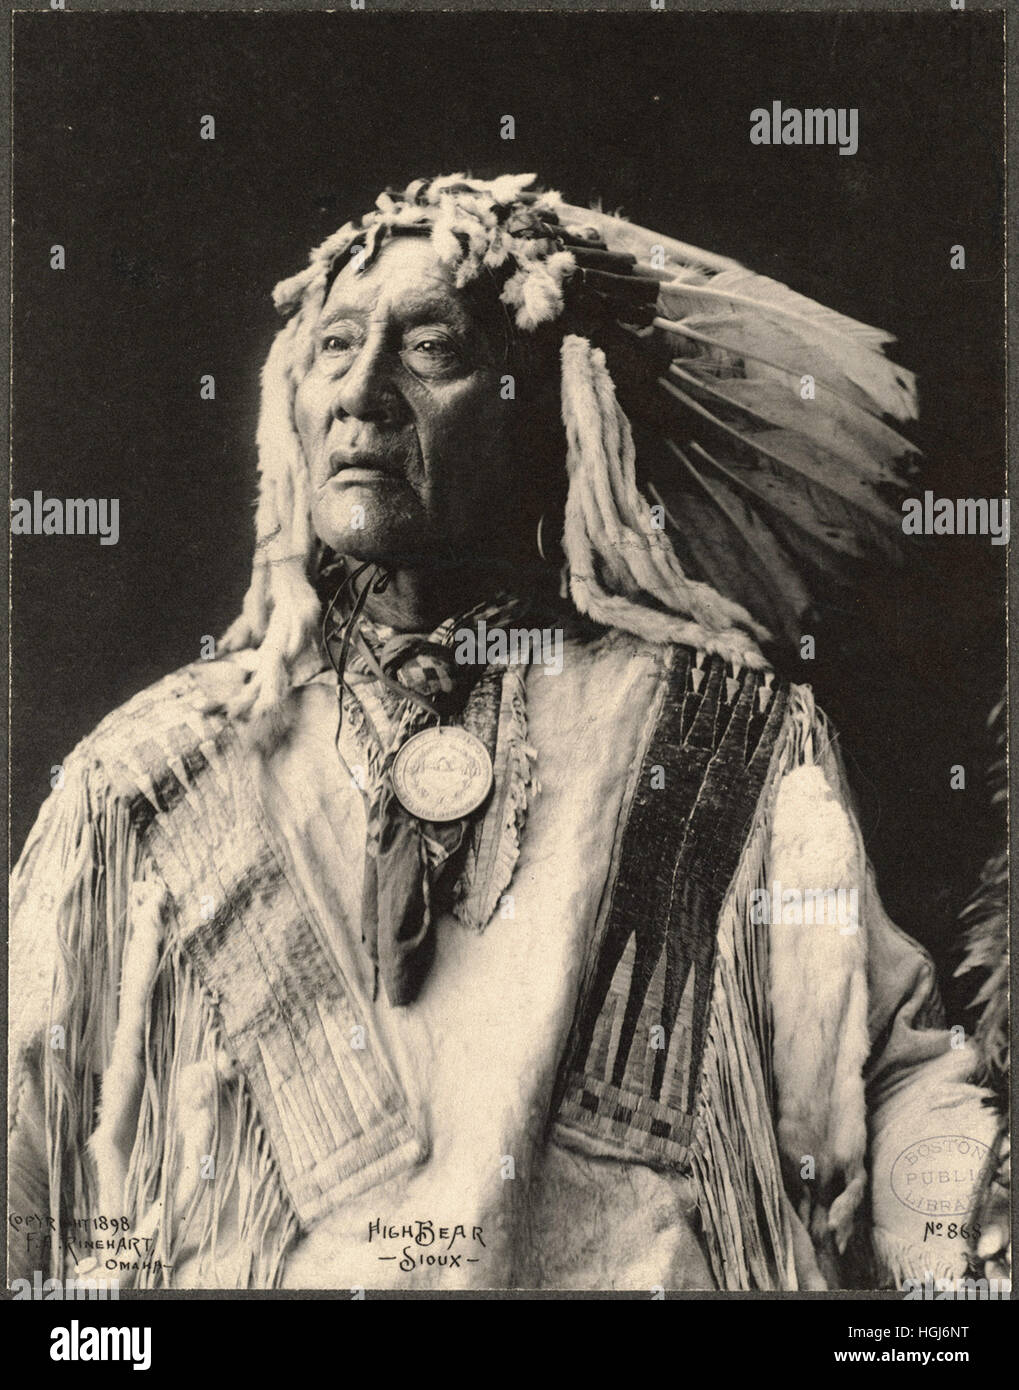 High Bear, Sioux   - 1898 Indian Congress - Photo : Frank A. Rinehart - Stock Image